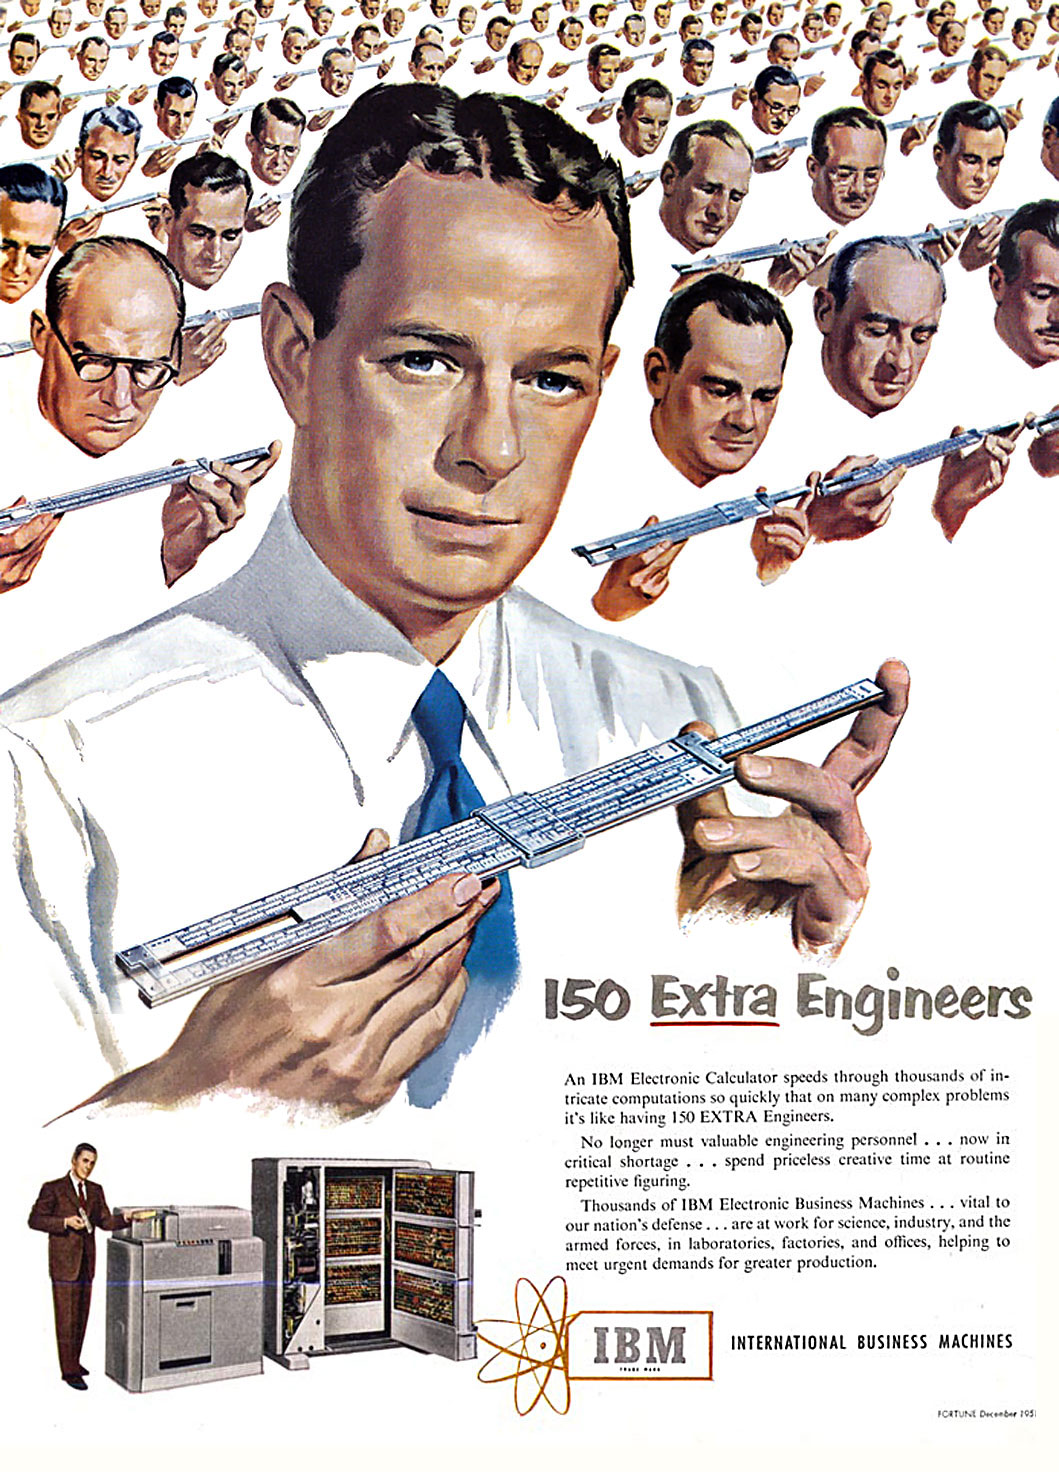 International Business Machines (IBM) - published in Fortune - December 1951